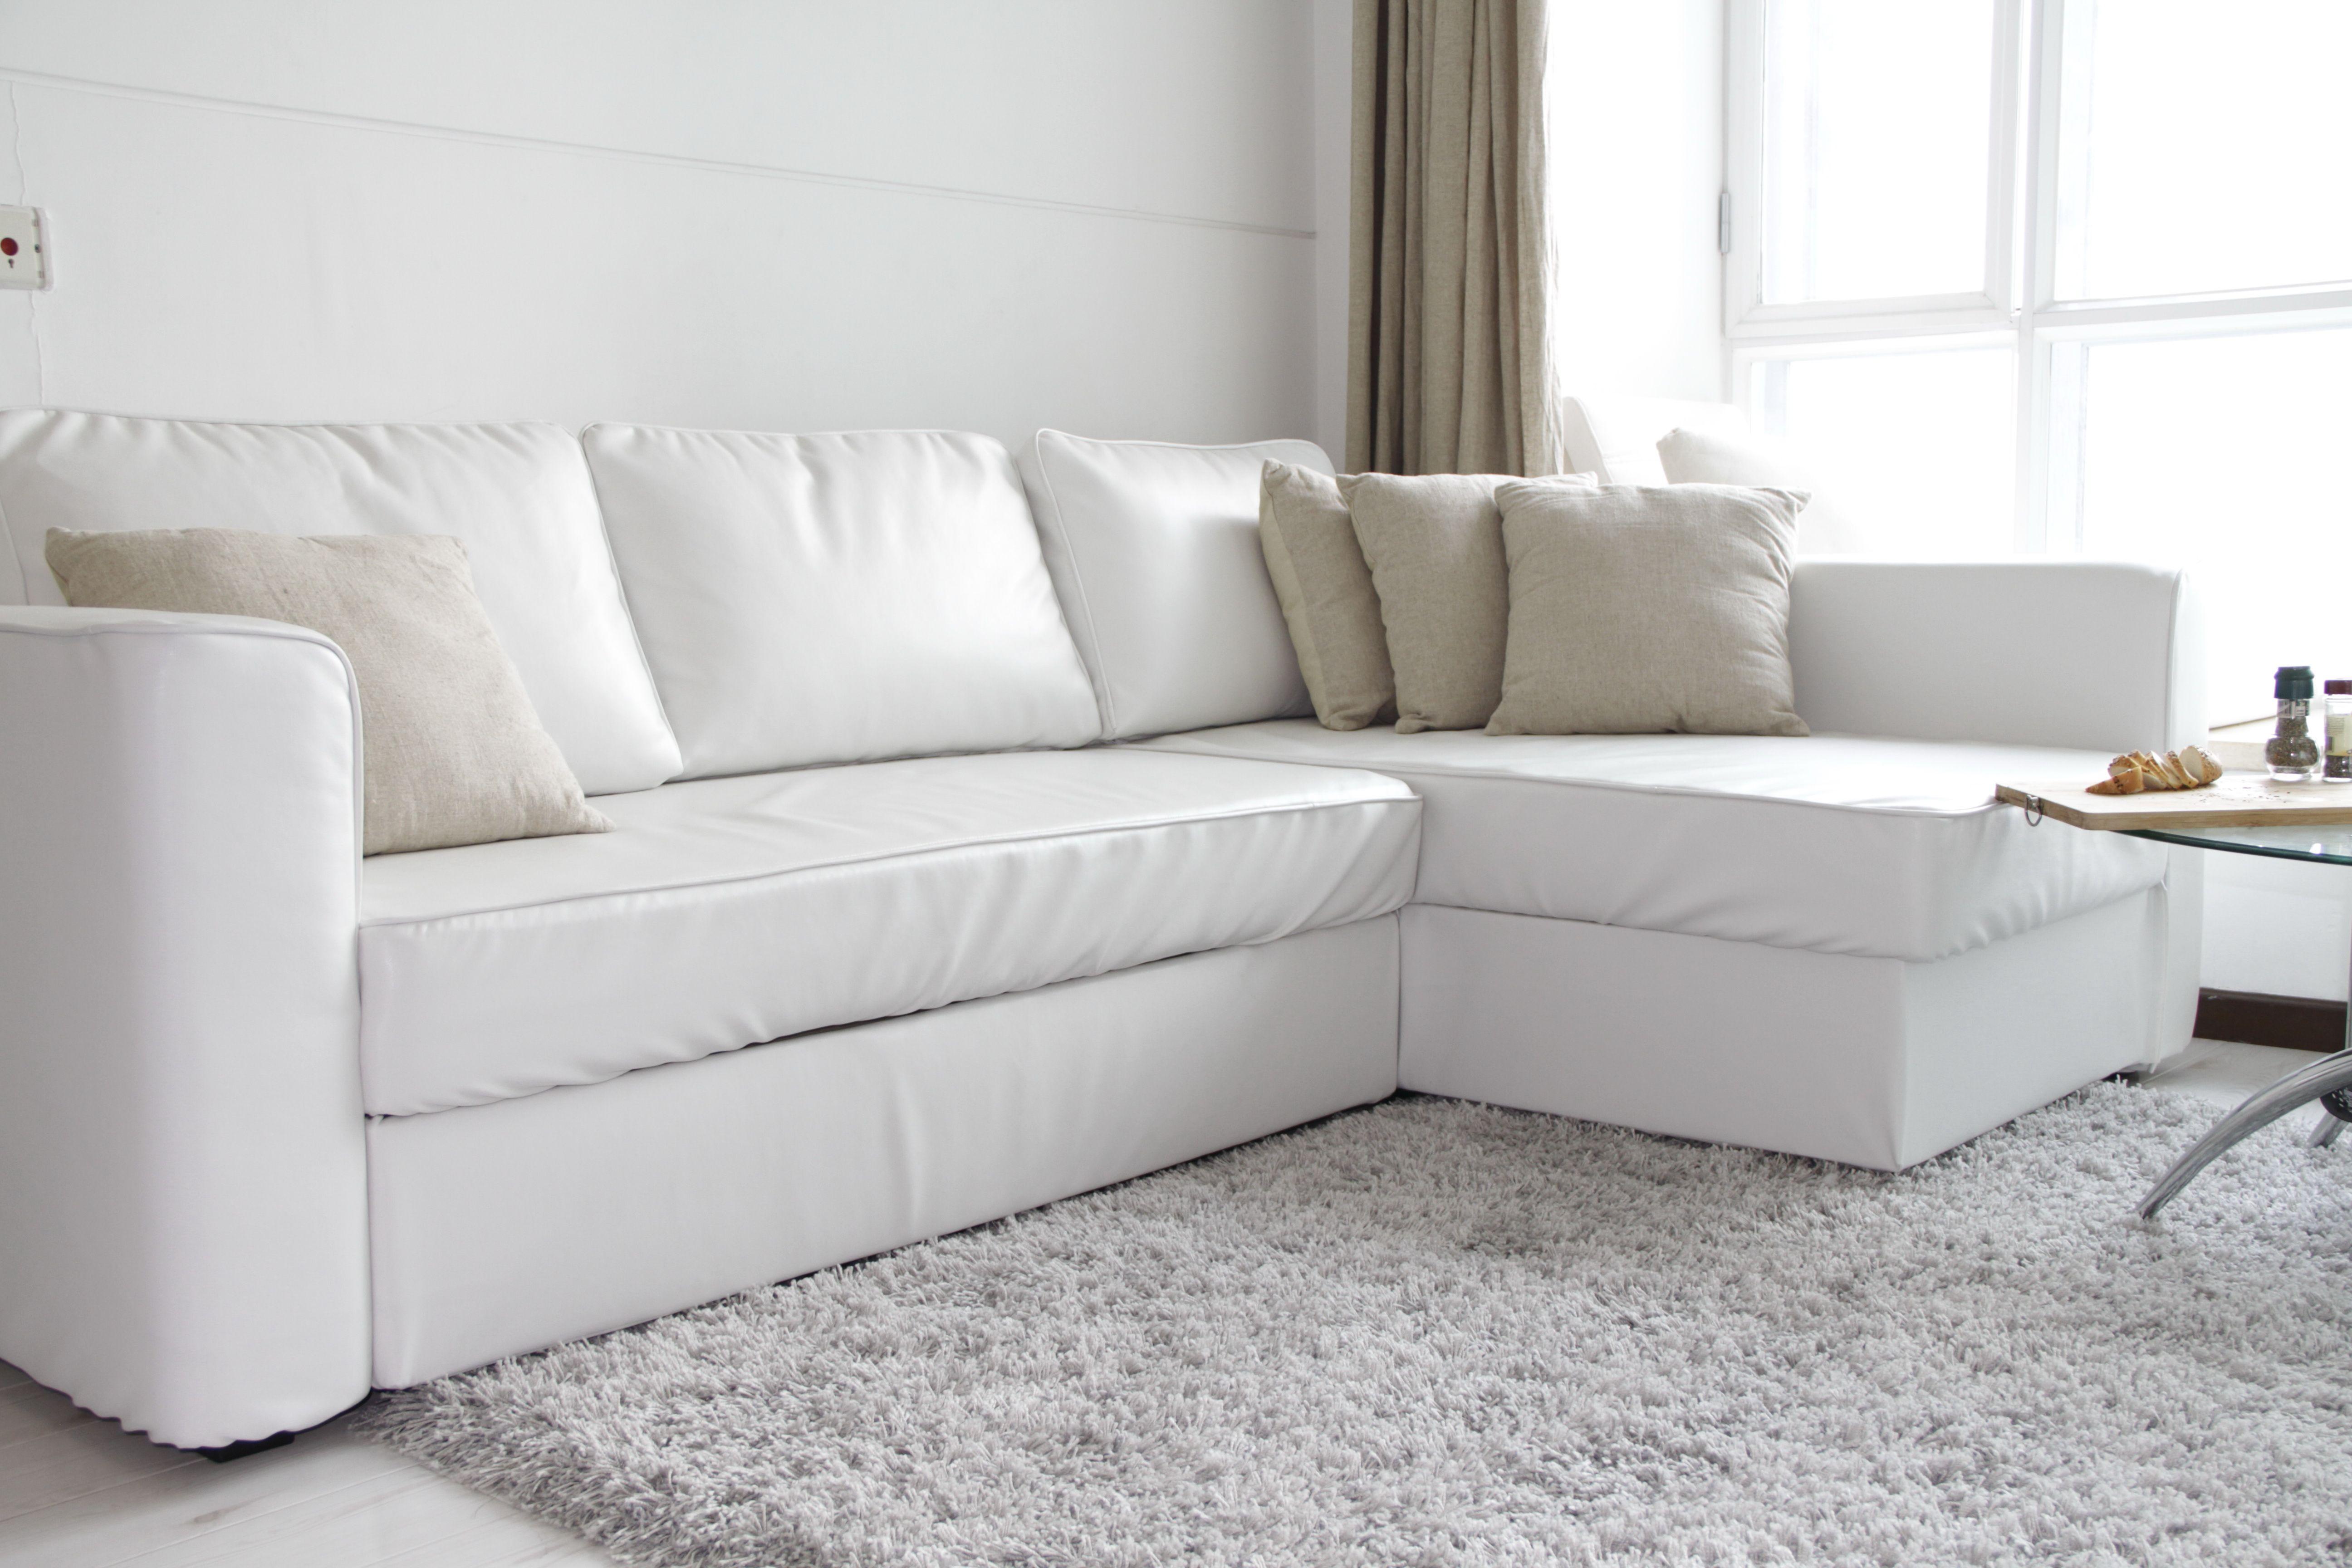 Ikea White Leather 2 Seater Sofa In 2020 Sectional Sofa Slipcovers Ikea Sofa Custom Couches